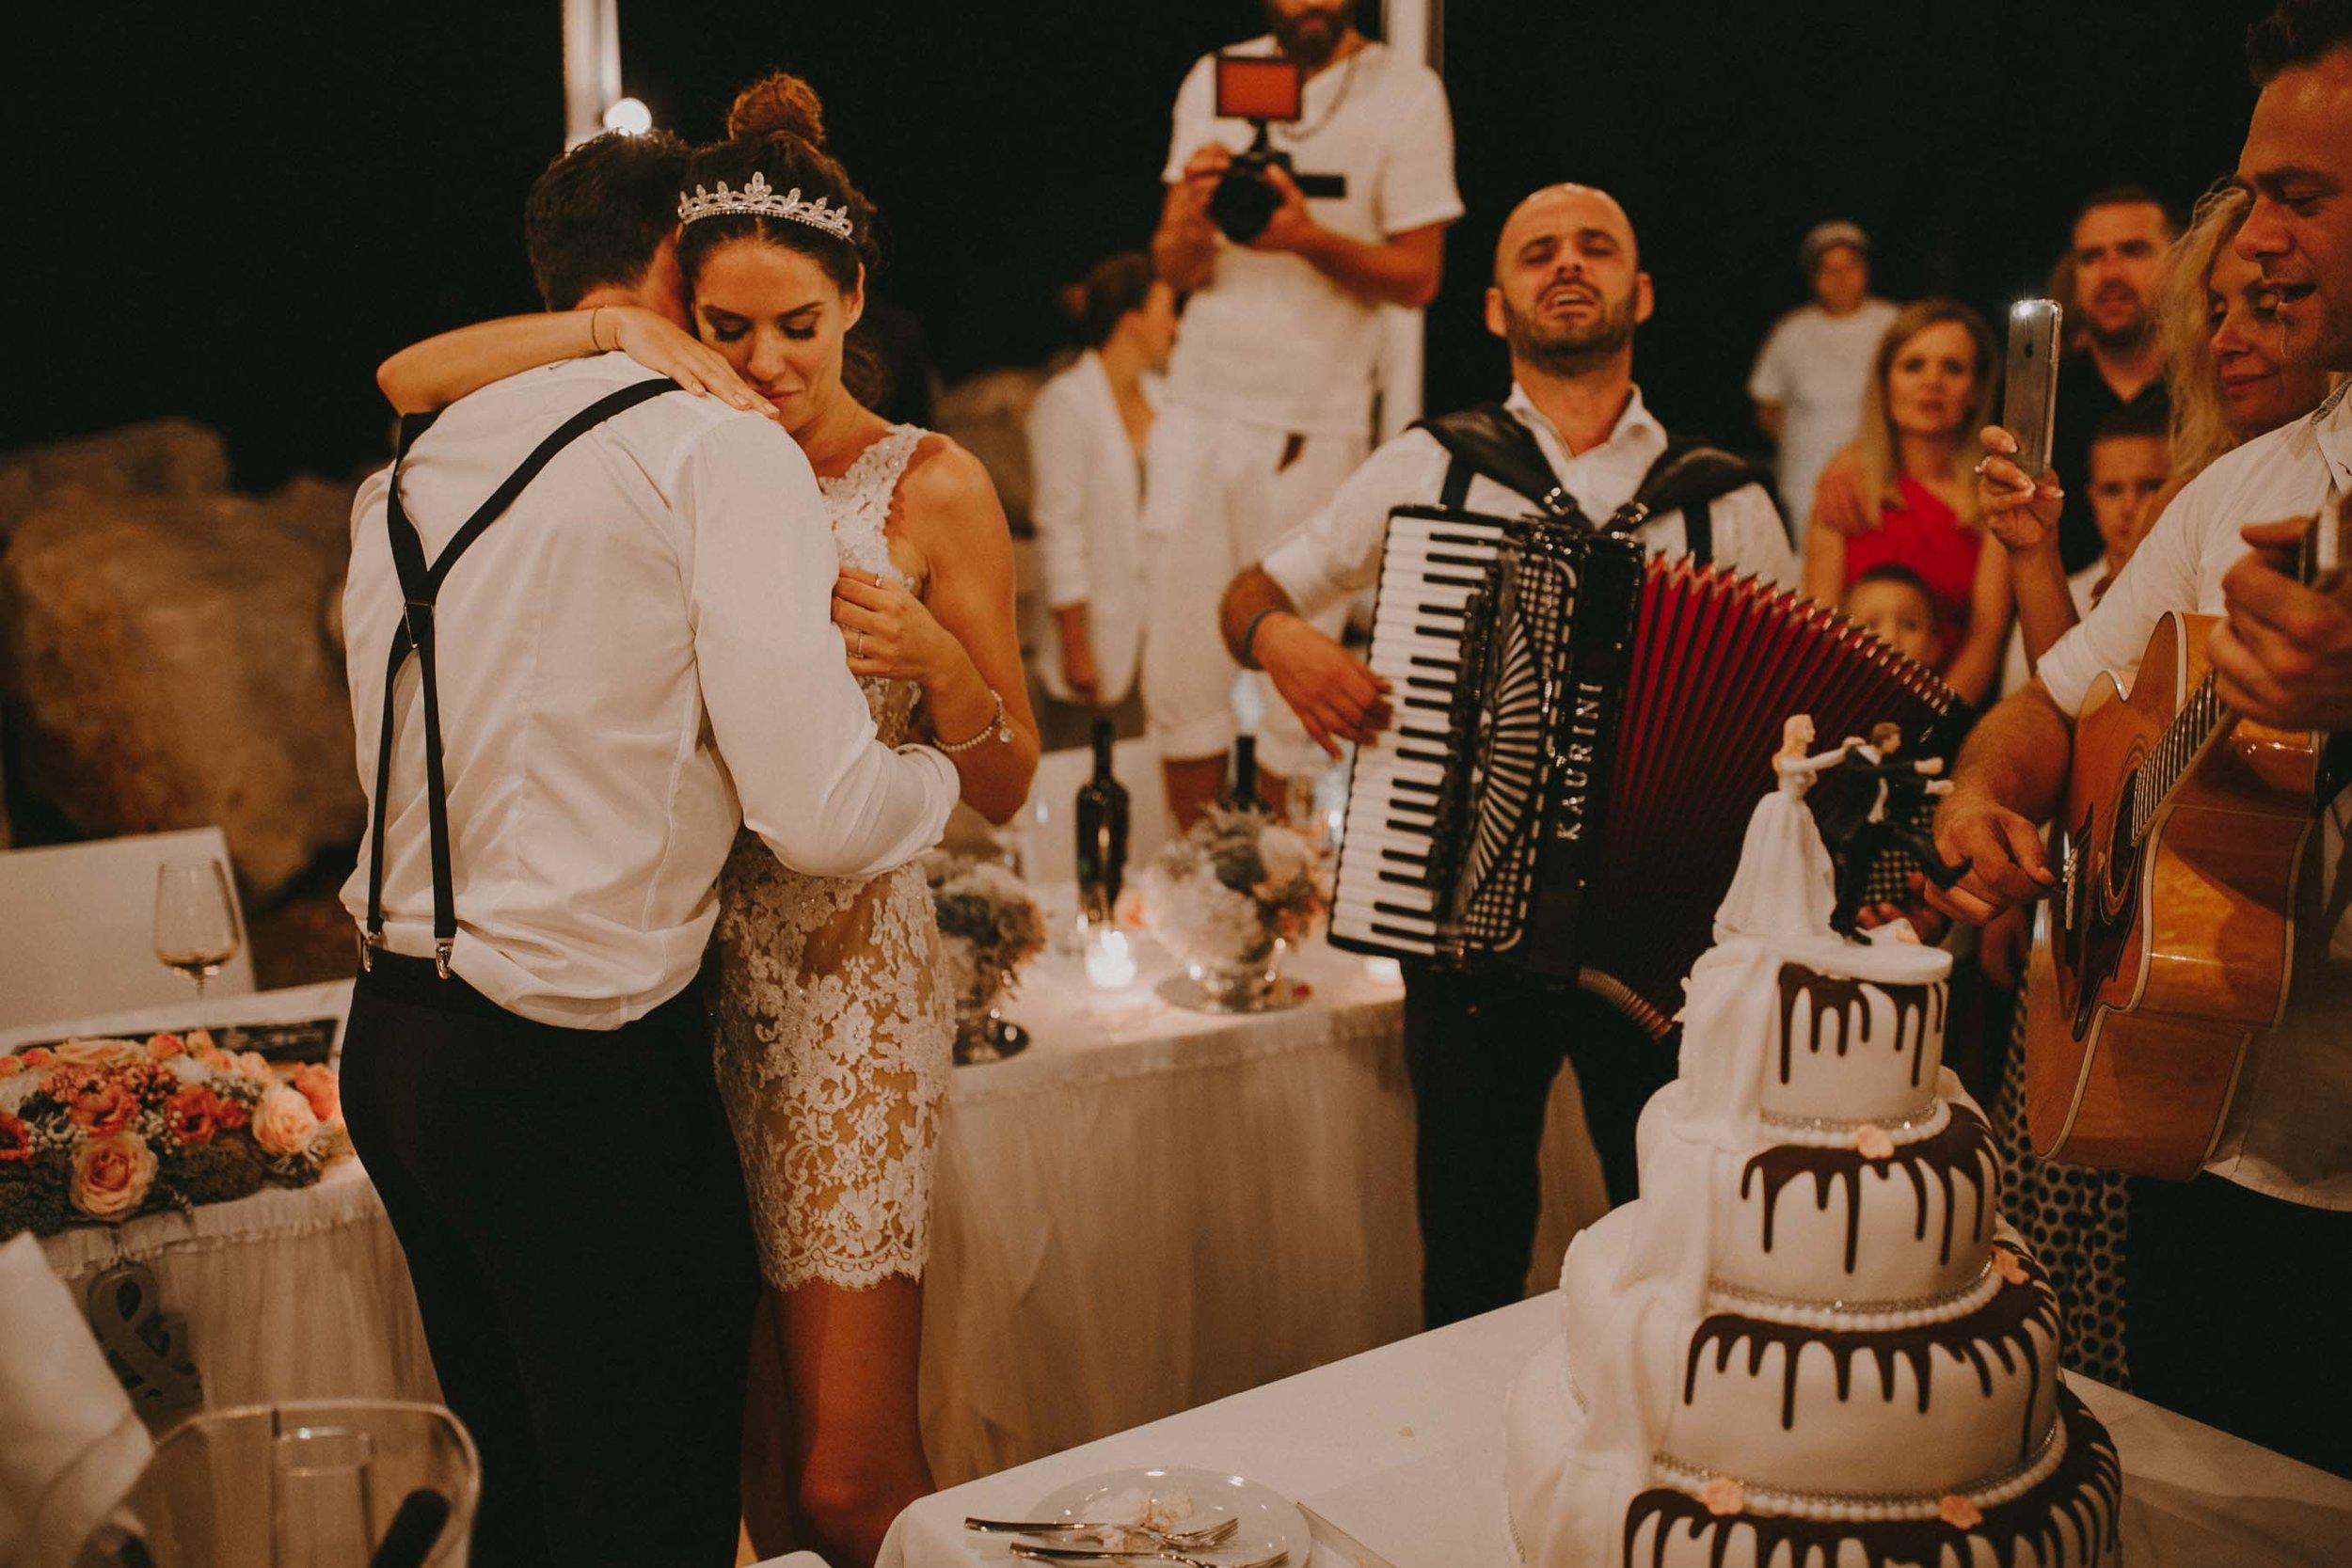 sylvia&dimitri-Wedding-Crvena_Luka-Croatia-131(0683).jpg